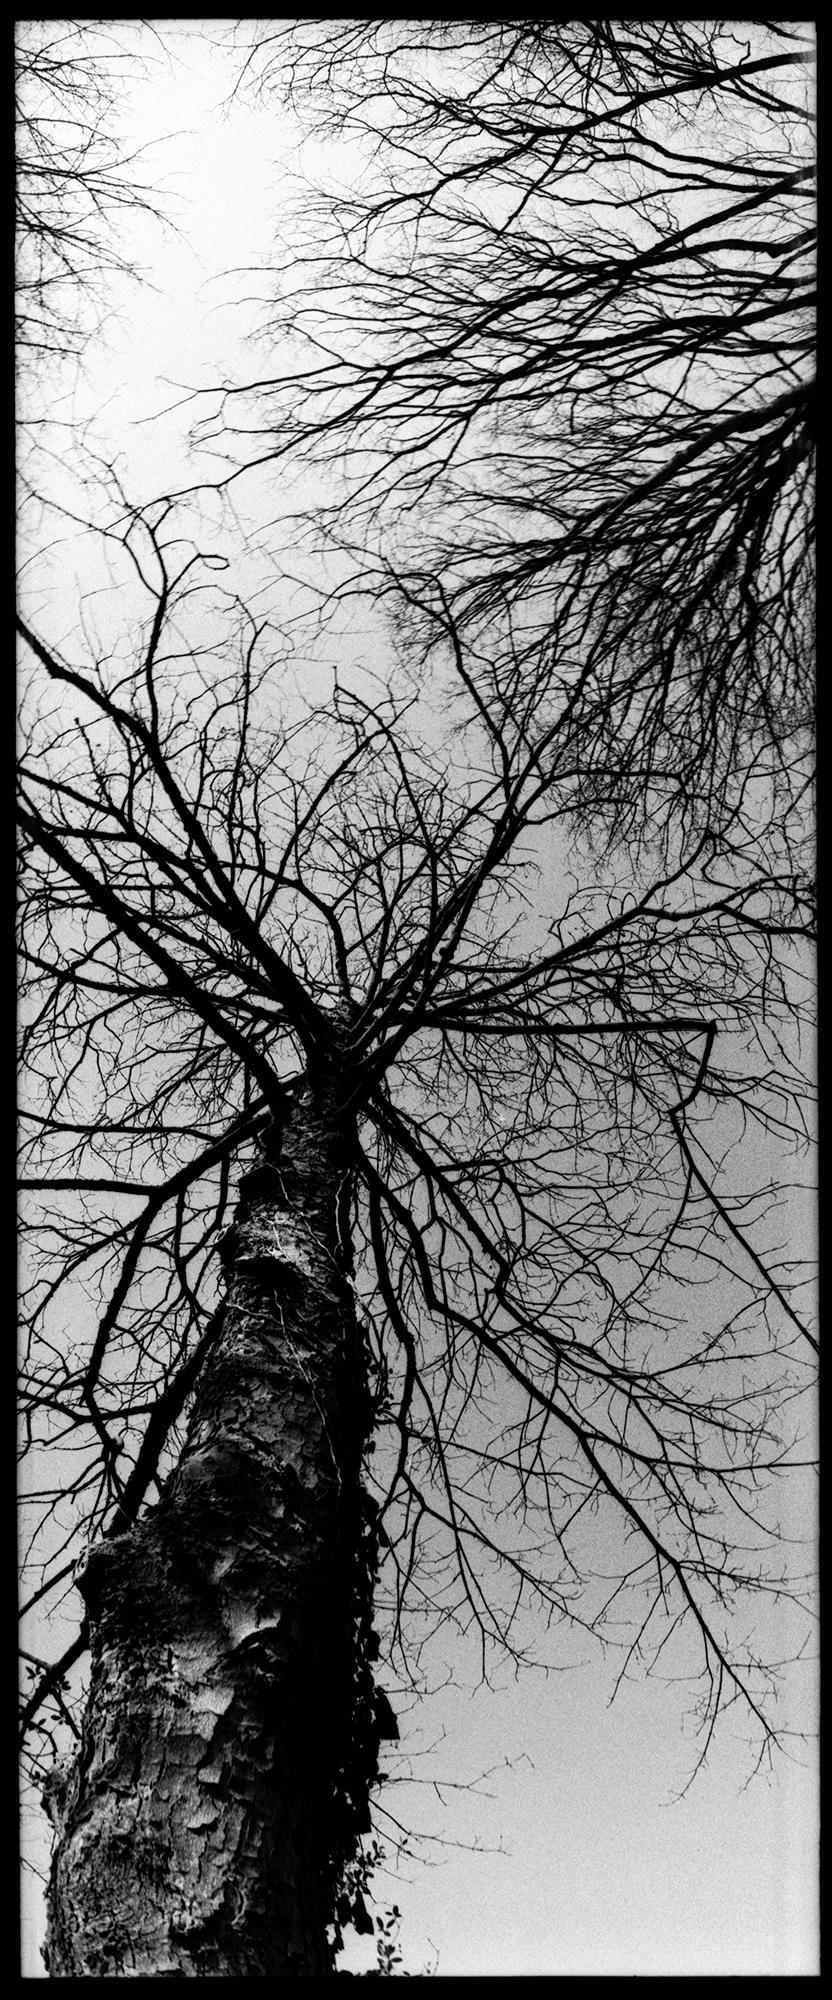 Trees, Plants, Flowers... by Laurent Orseau #143